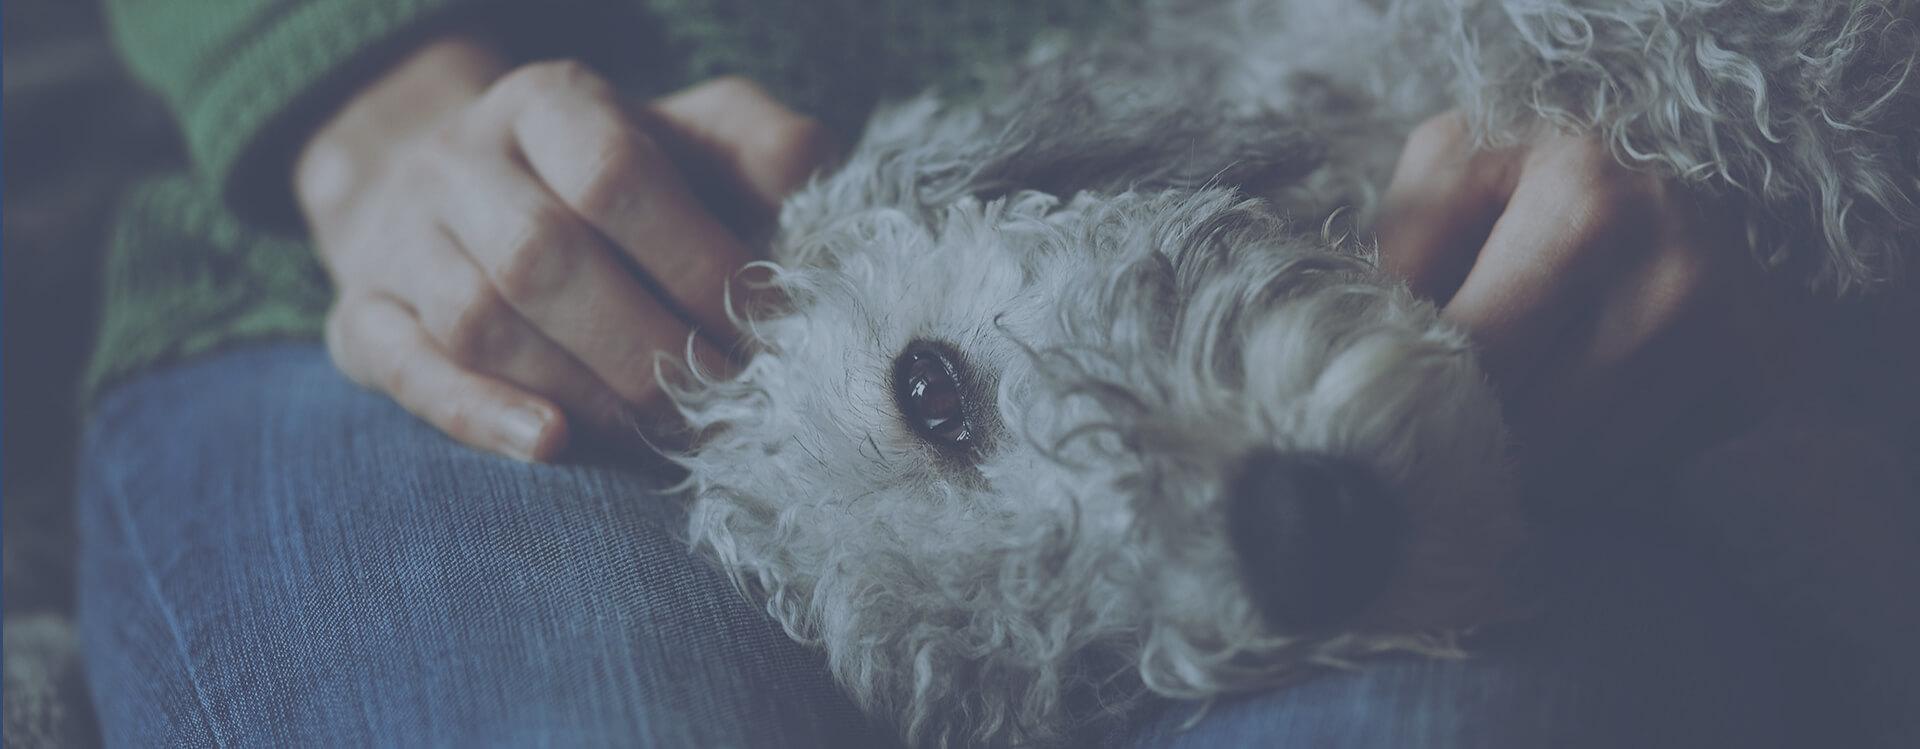 Contact Pet Health